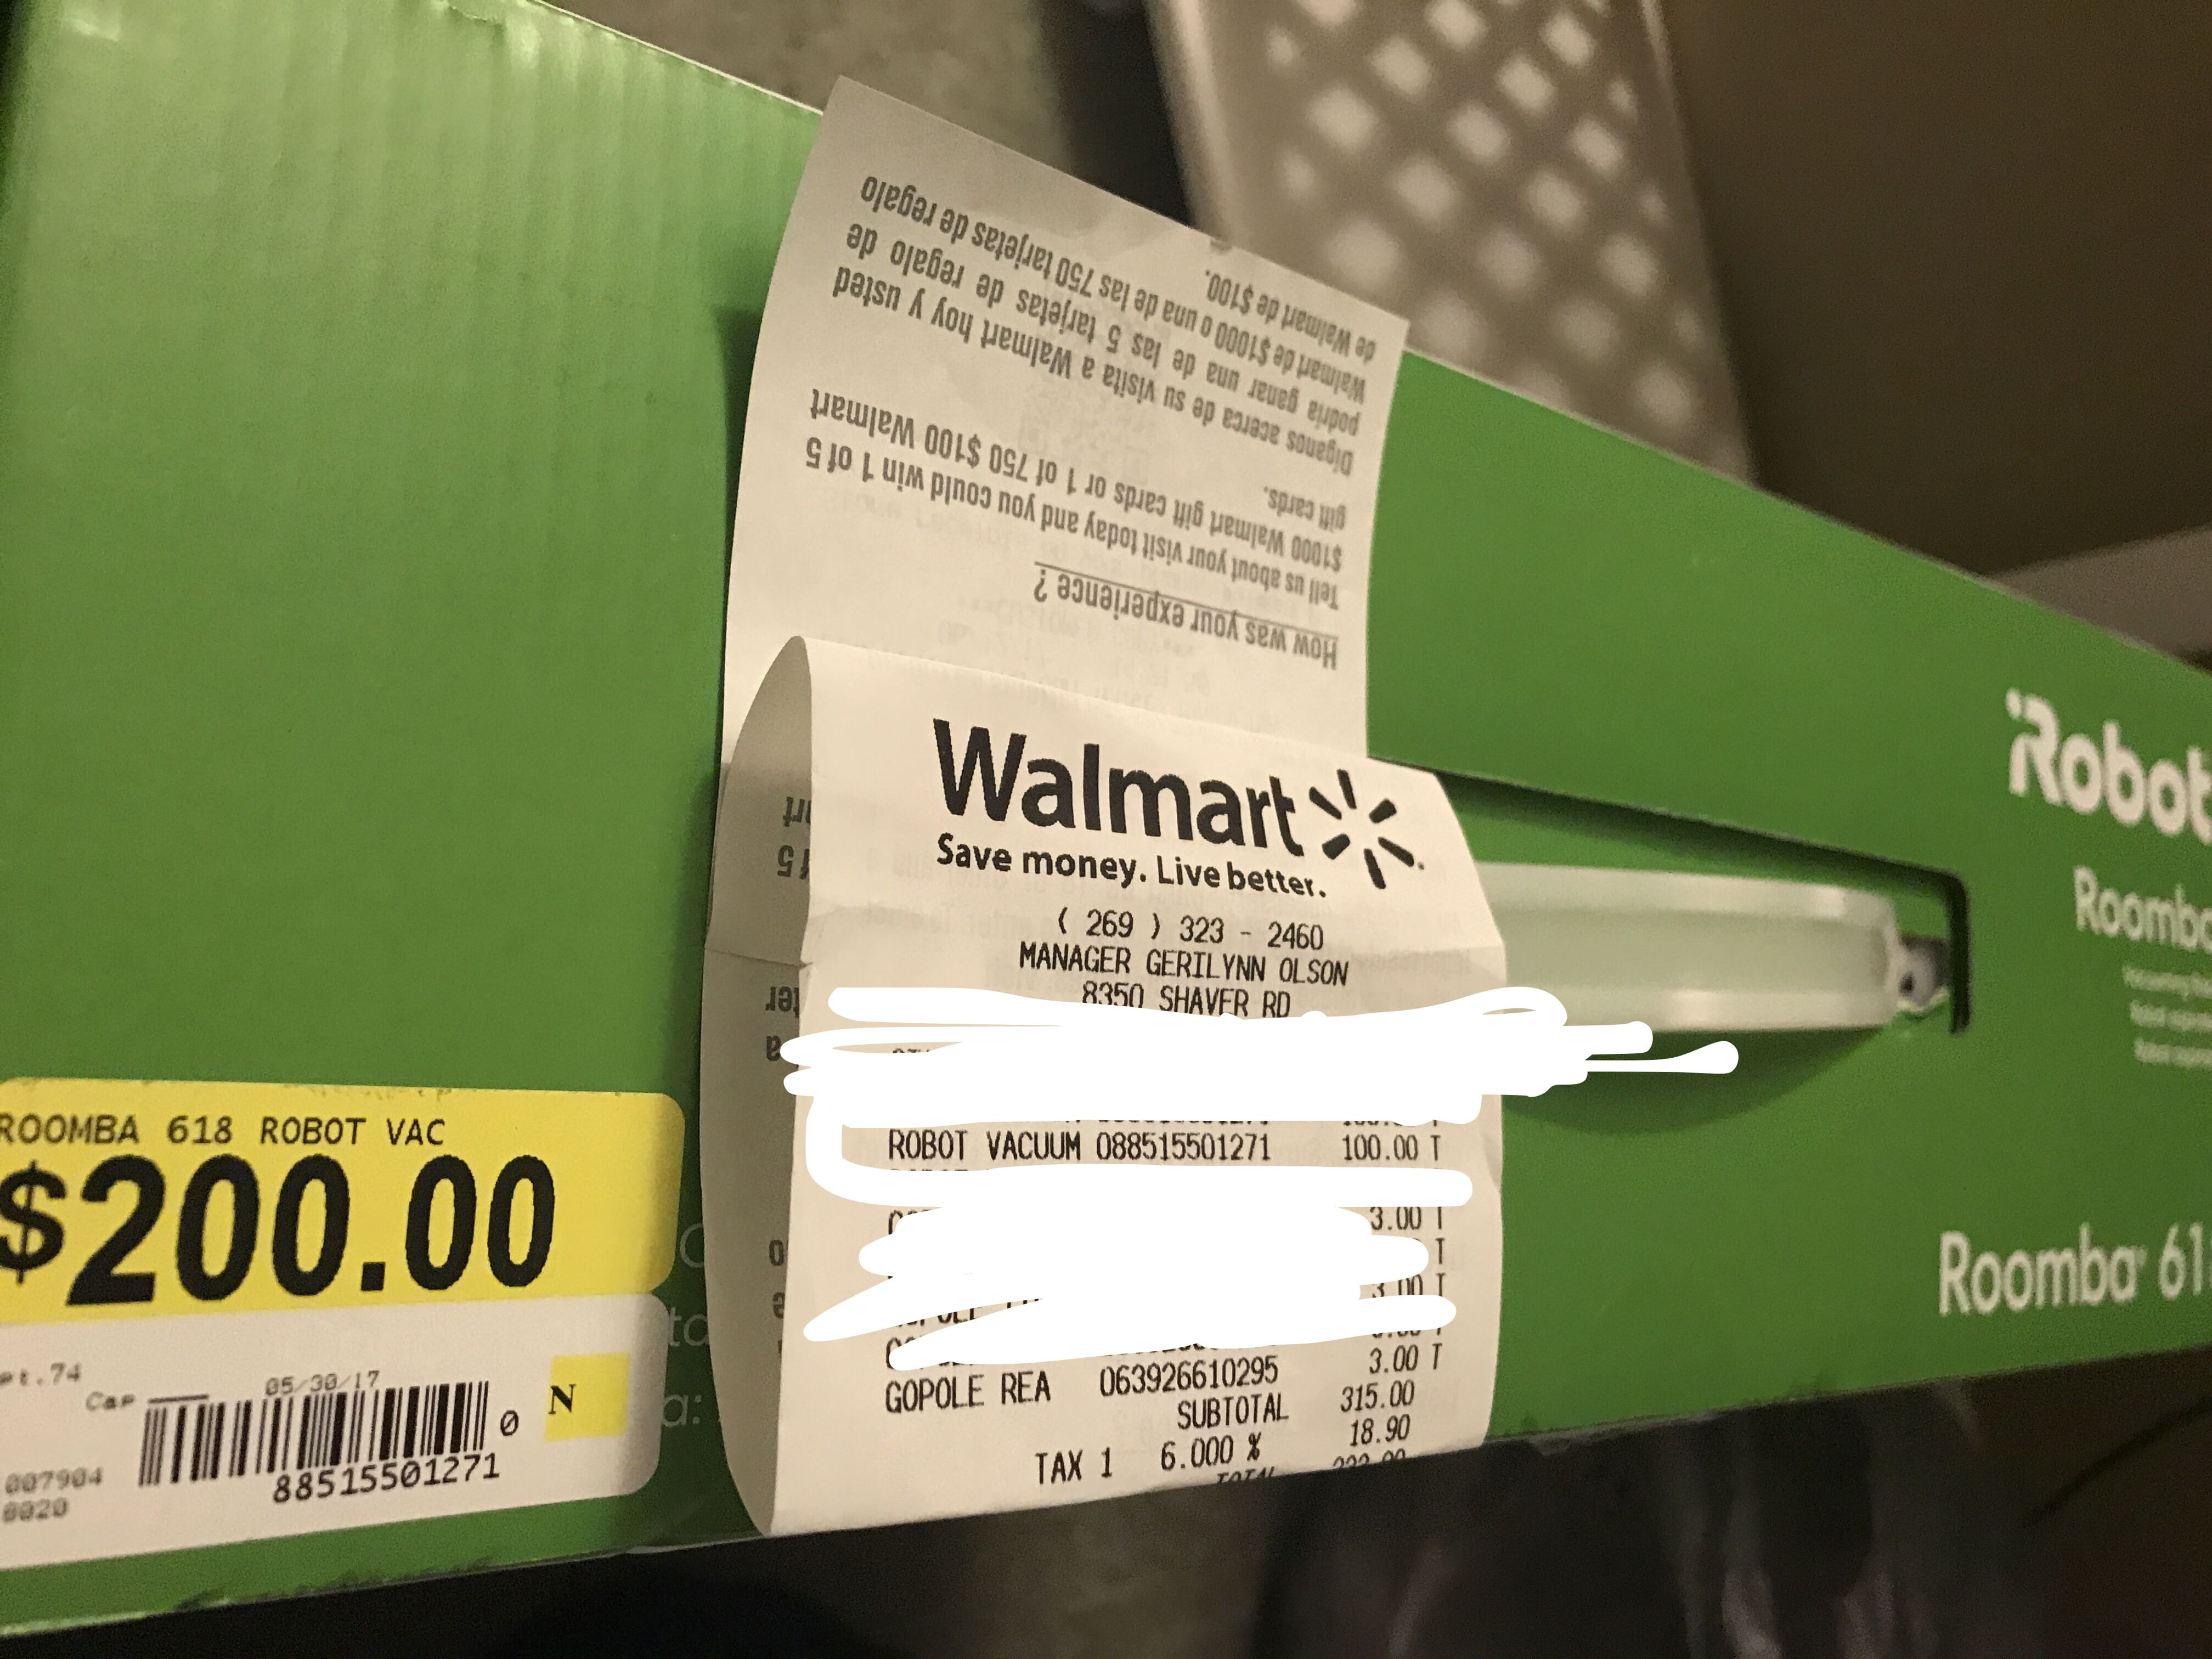 iRobot Roomba 618 $100 Walmart YMMV Vacuum